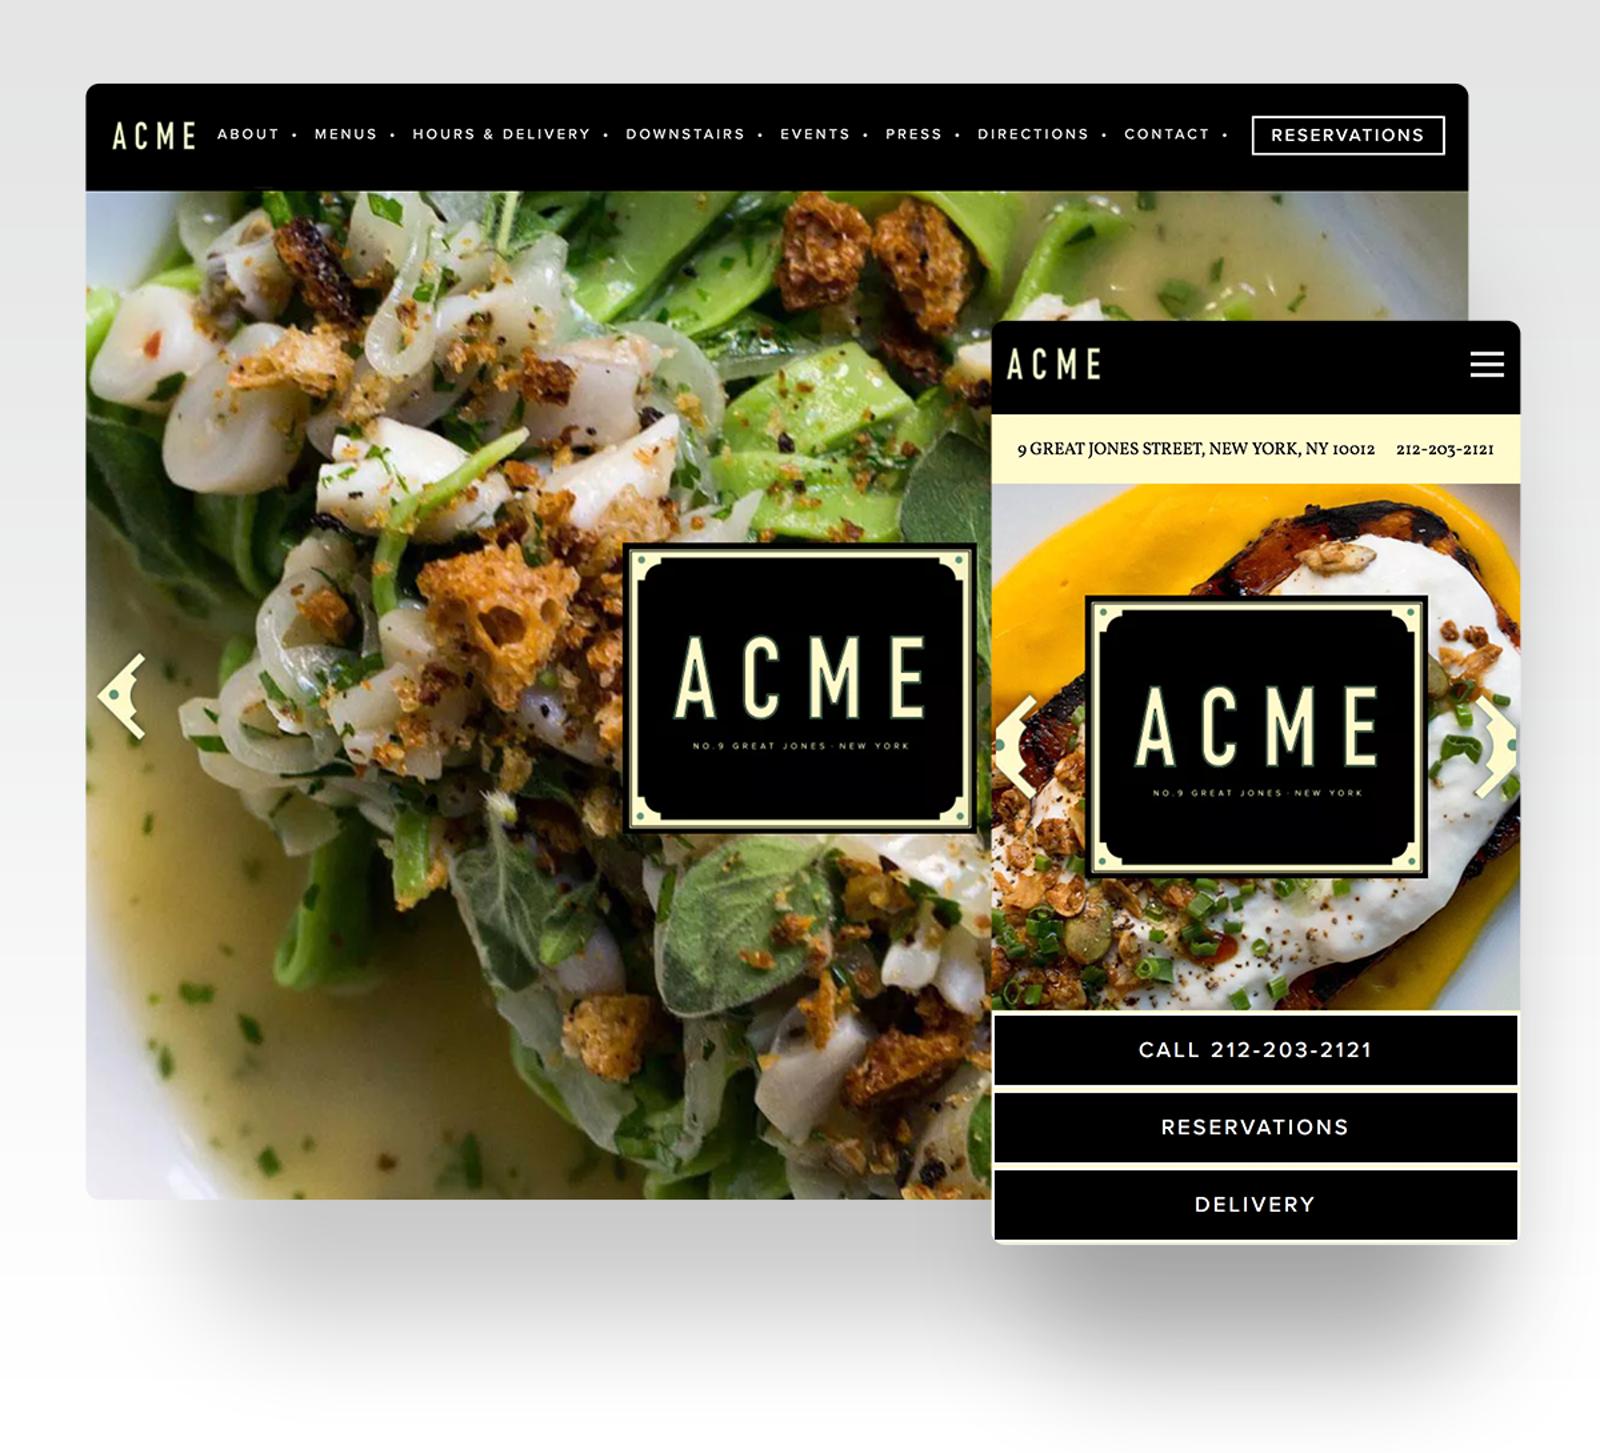 ACME website